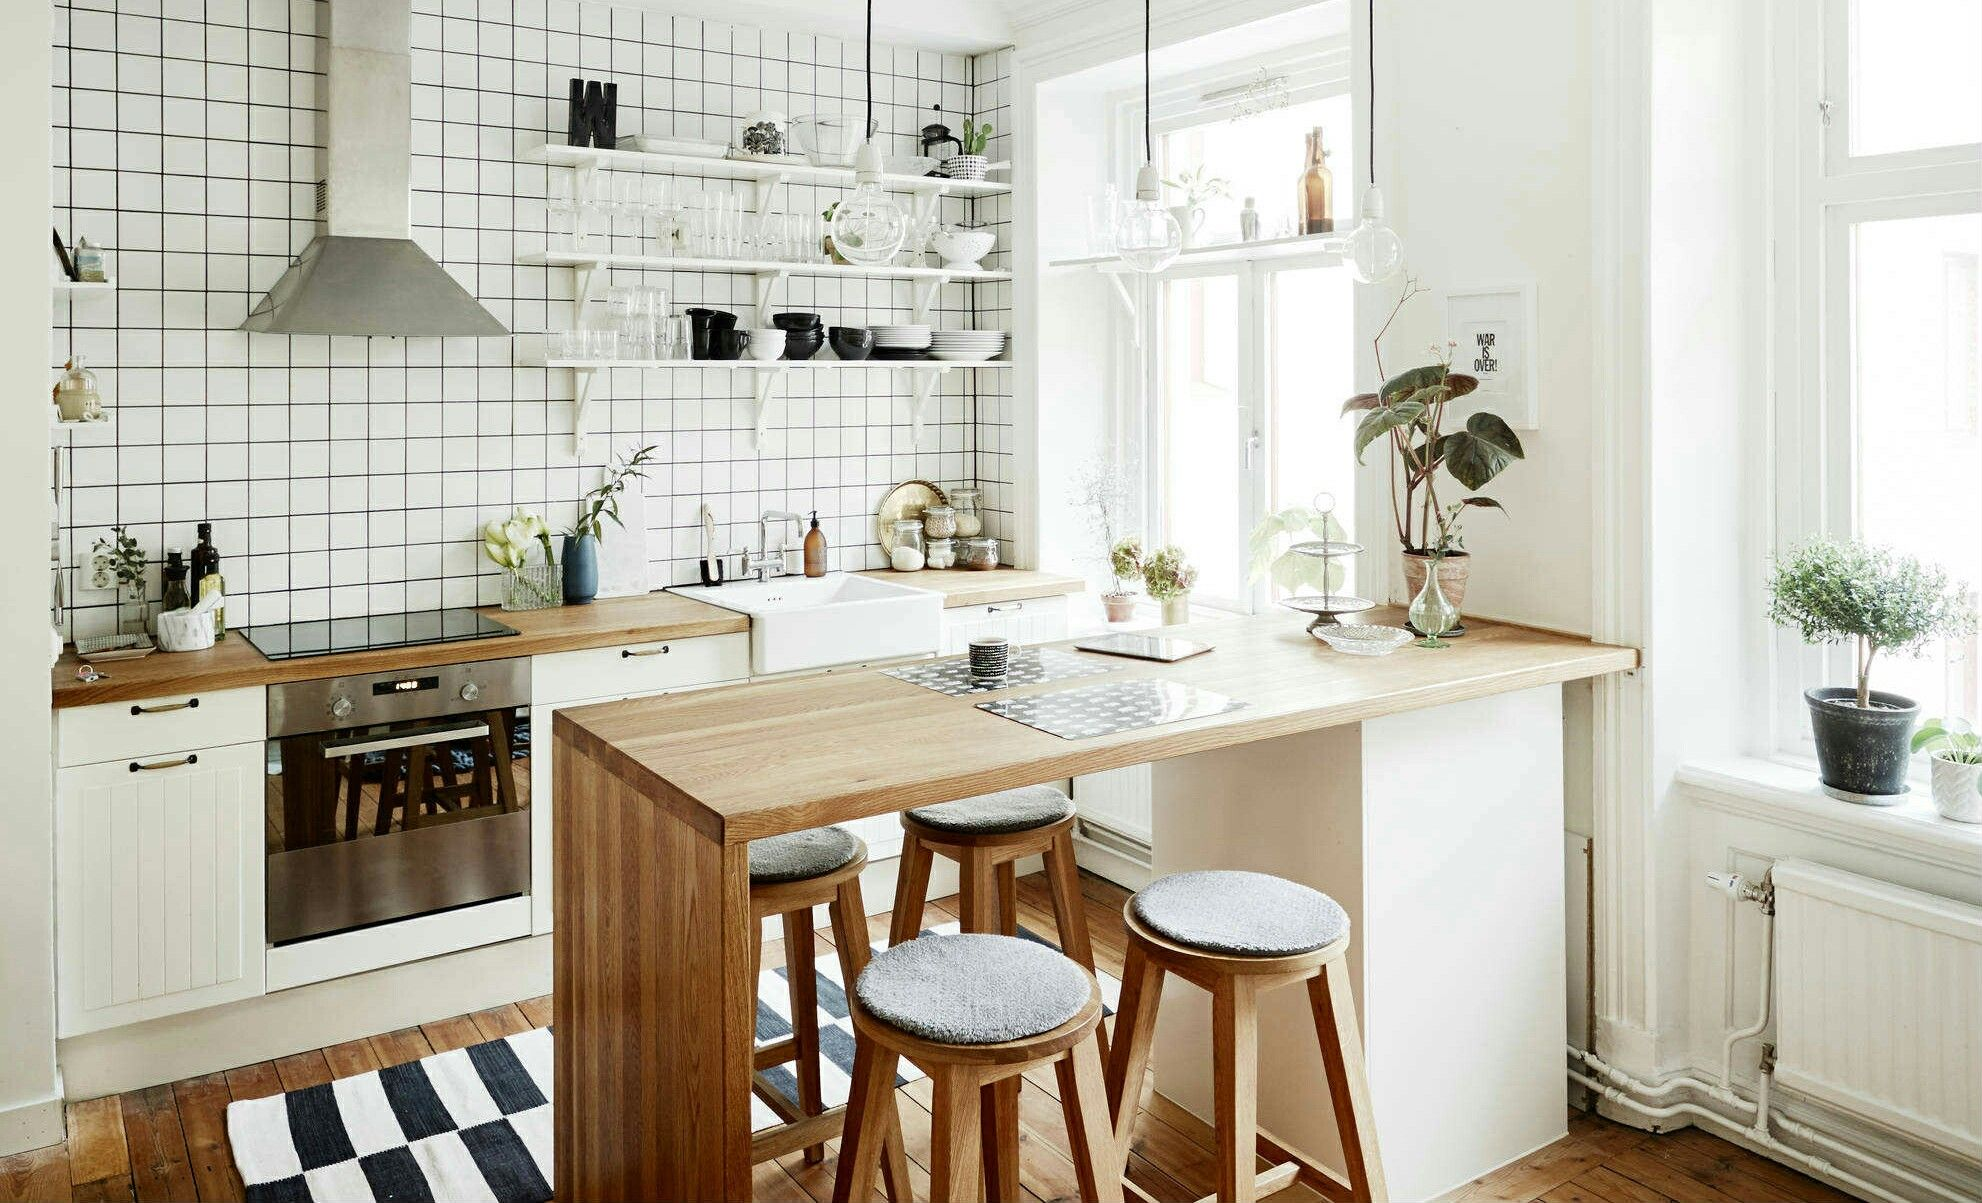 Pin by Petra Kozmonova on Kitchen | Pinterest | Kitchens, Kitchen ...